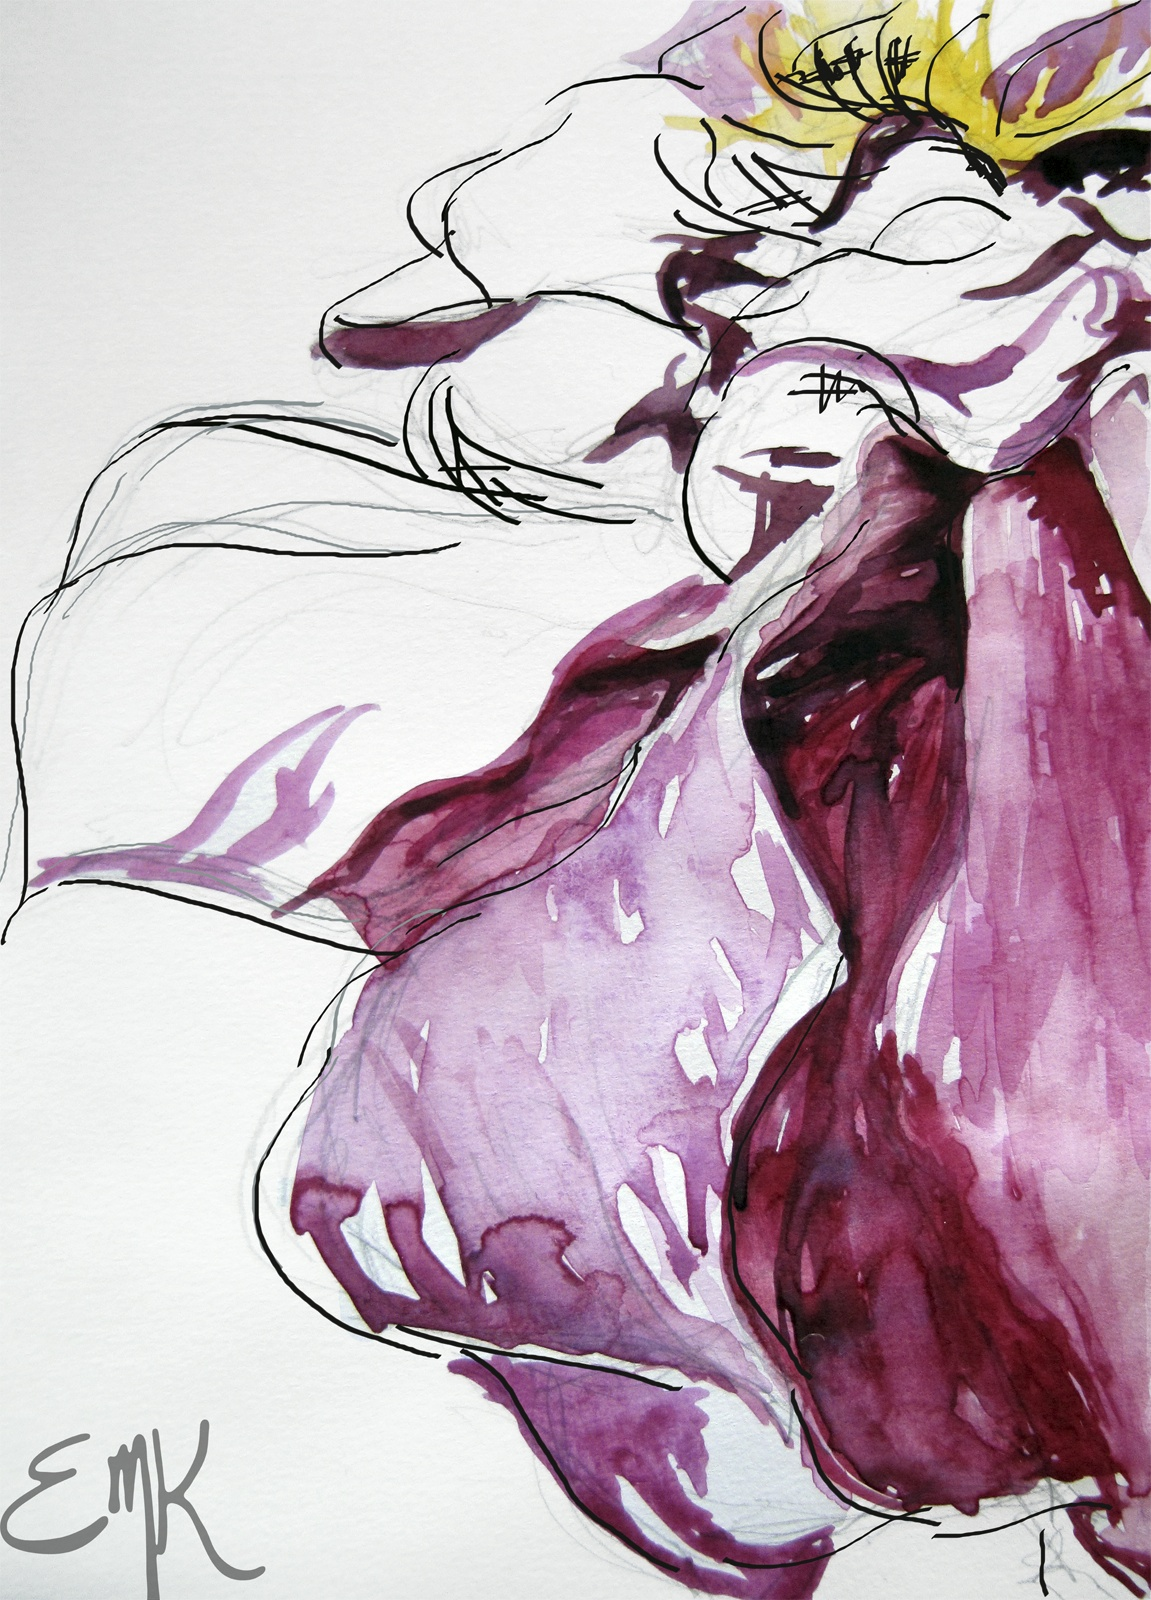 Pink Flower Sketch emk.jpg